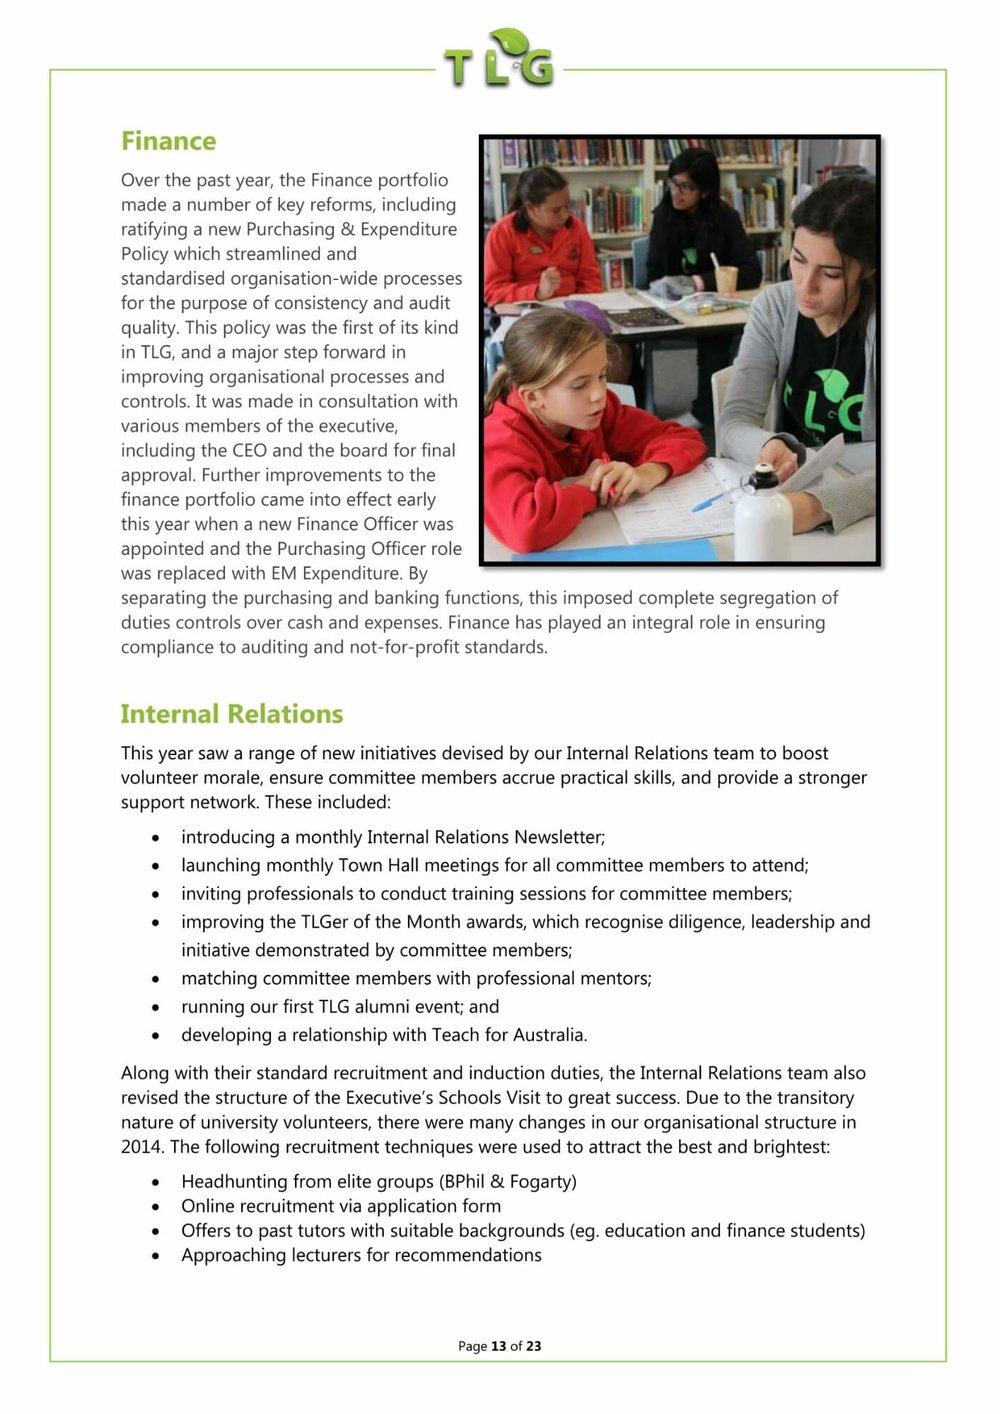 tlg-annual-report-FY13-13.jpg